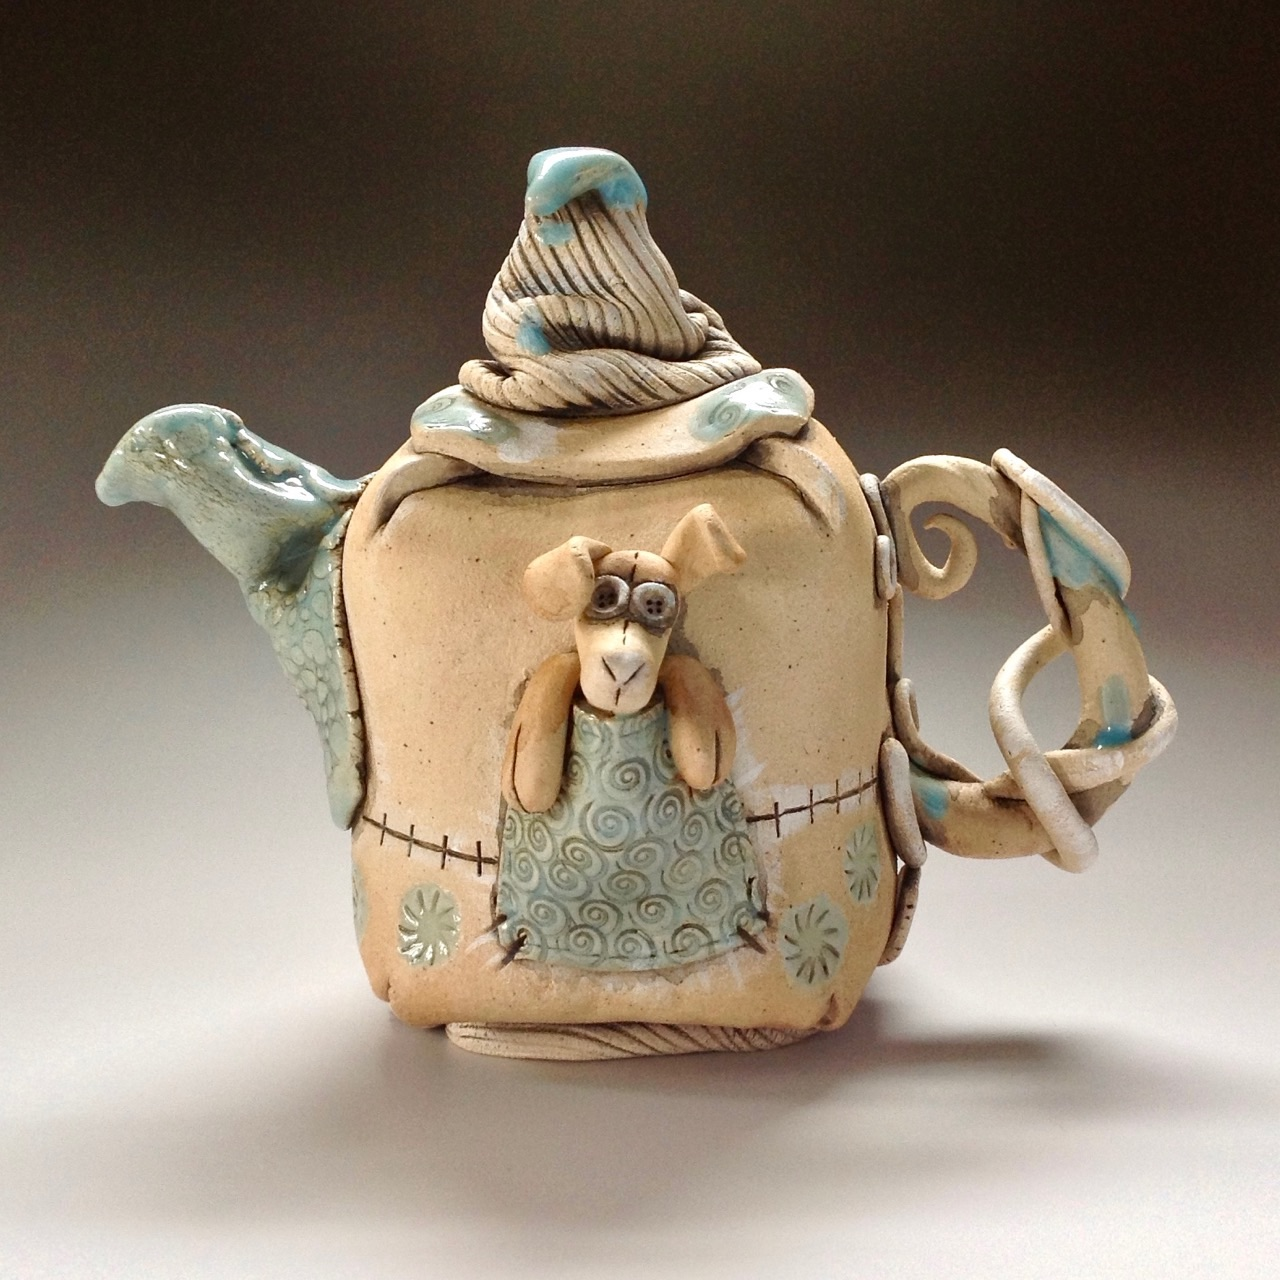 Tea Pot Sculpture Ceramic Pottery